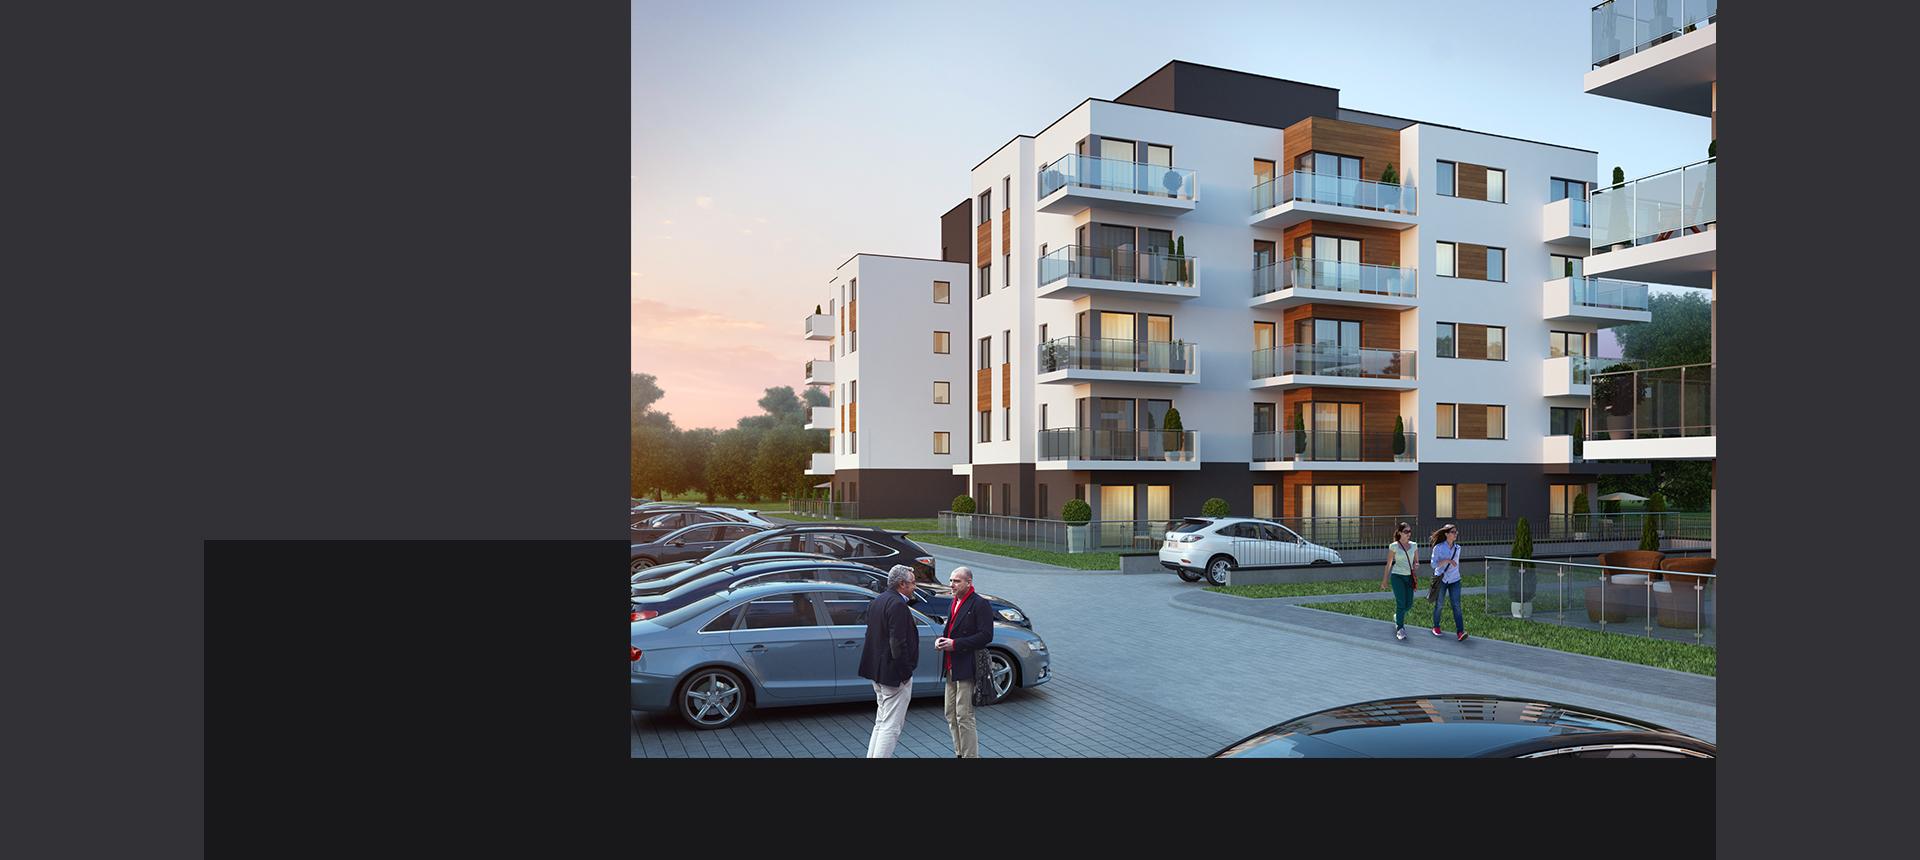 oktan investment_ ostoya pucka_ ostoja_ puck_mieszkania deweloper_ apartamenty_ sprzedaż